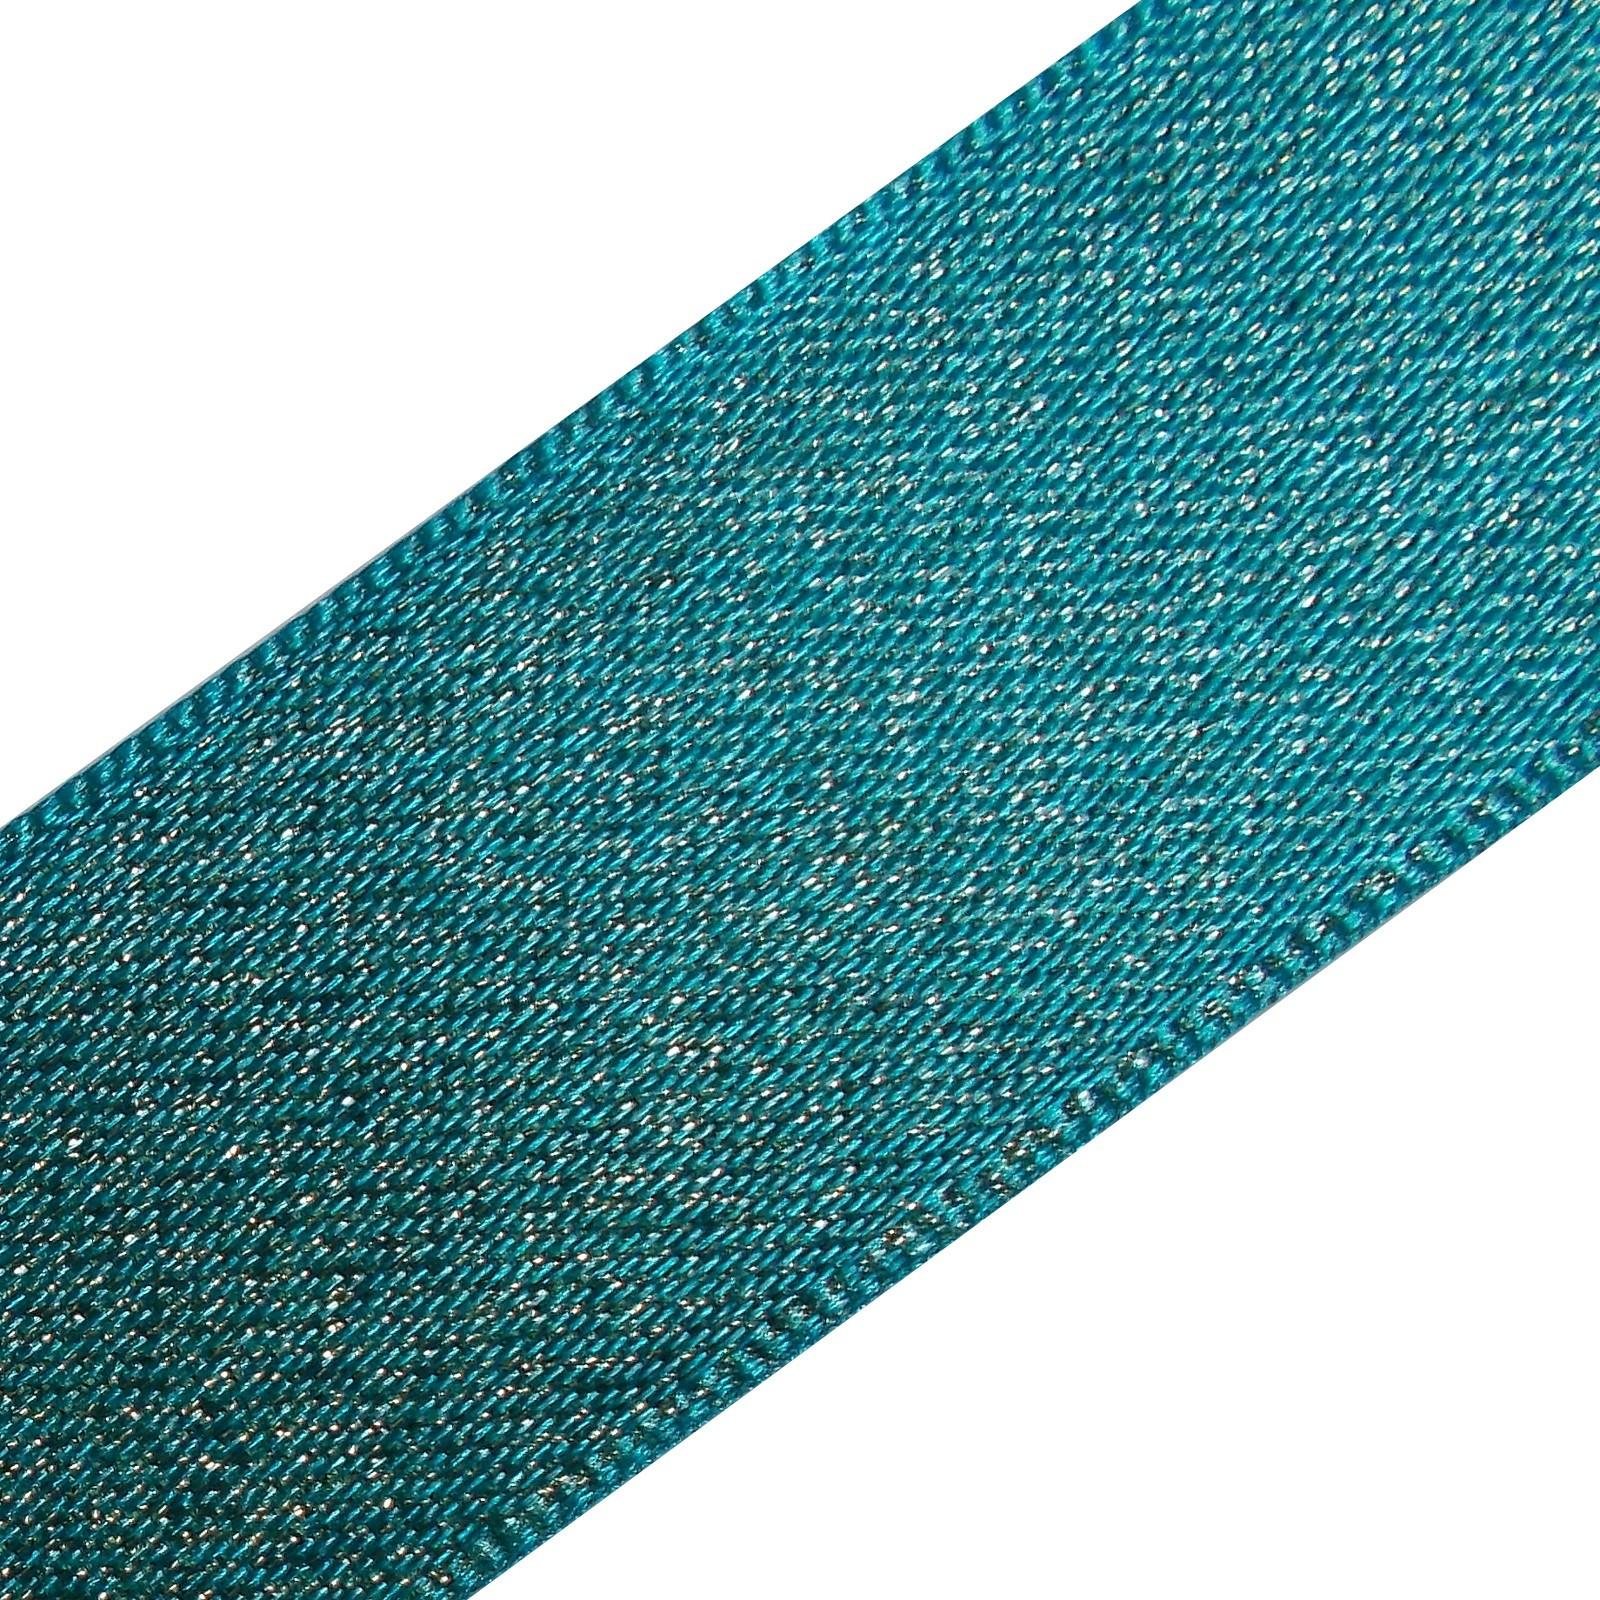 Berisfords Glitter Satin Ribbon 10mm wide Blue 2 metre length